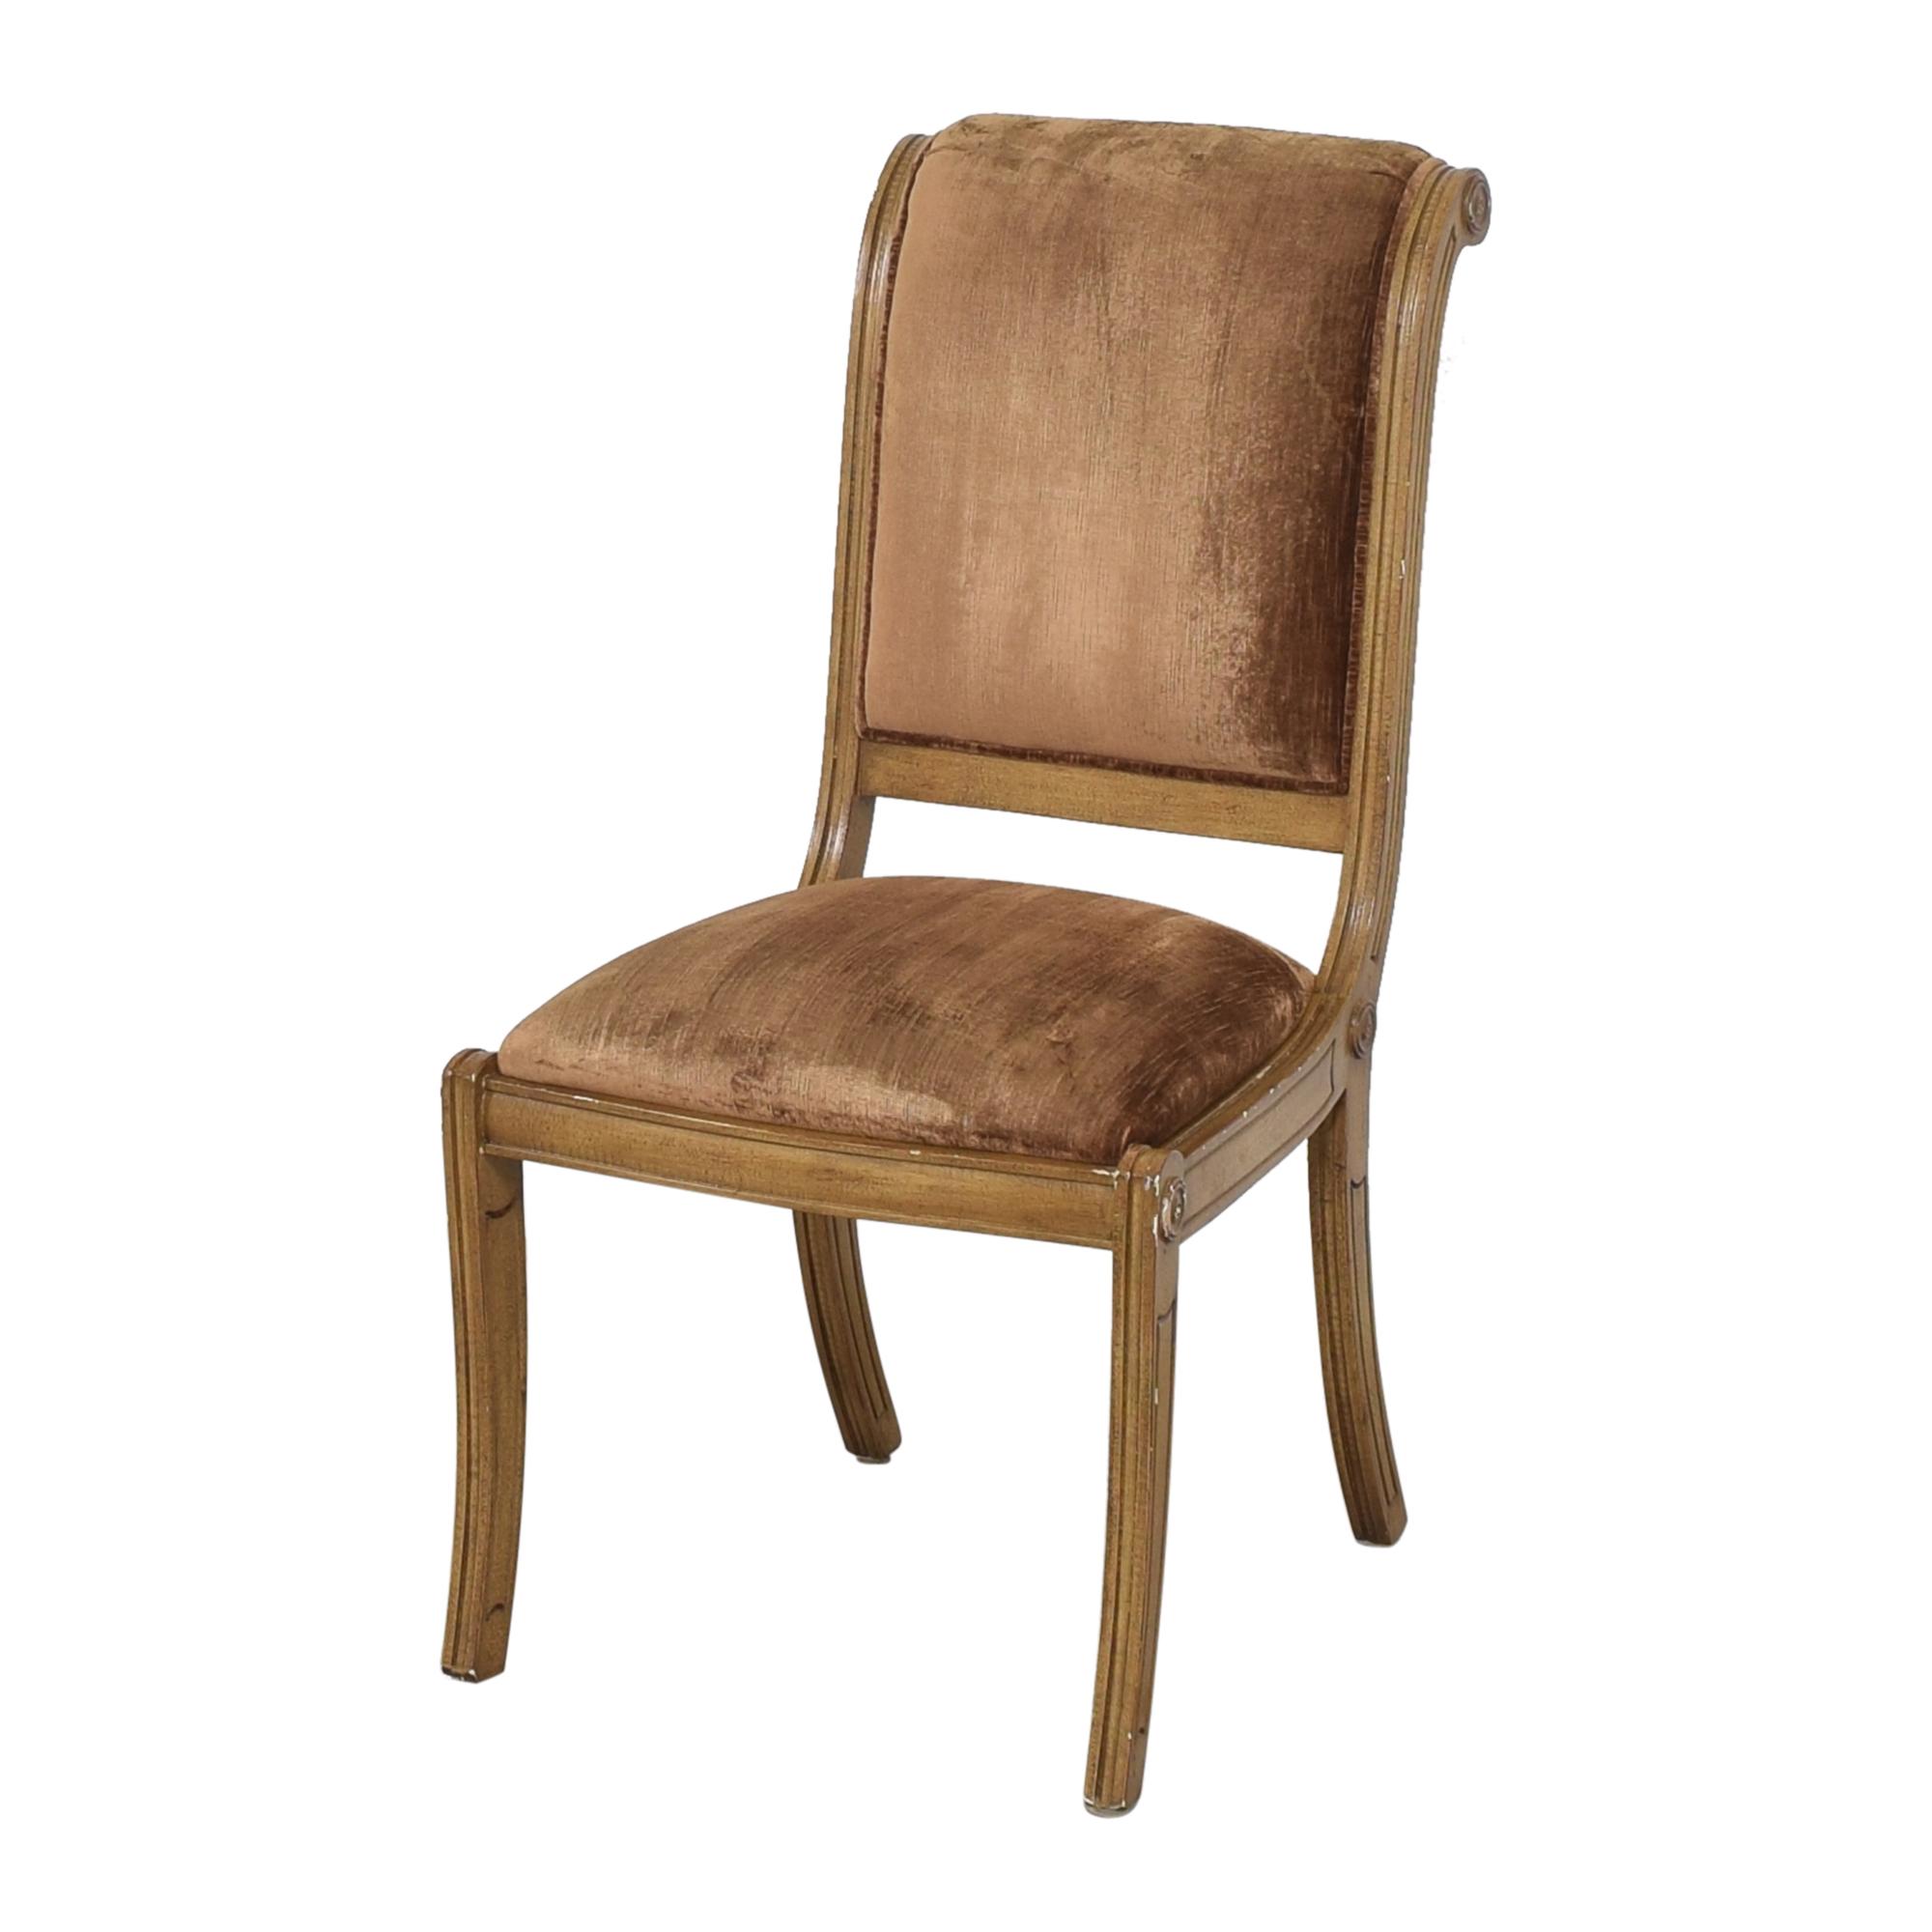 Robert Allen Robert Allen Rodeo Side Dining Chairs dimensions